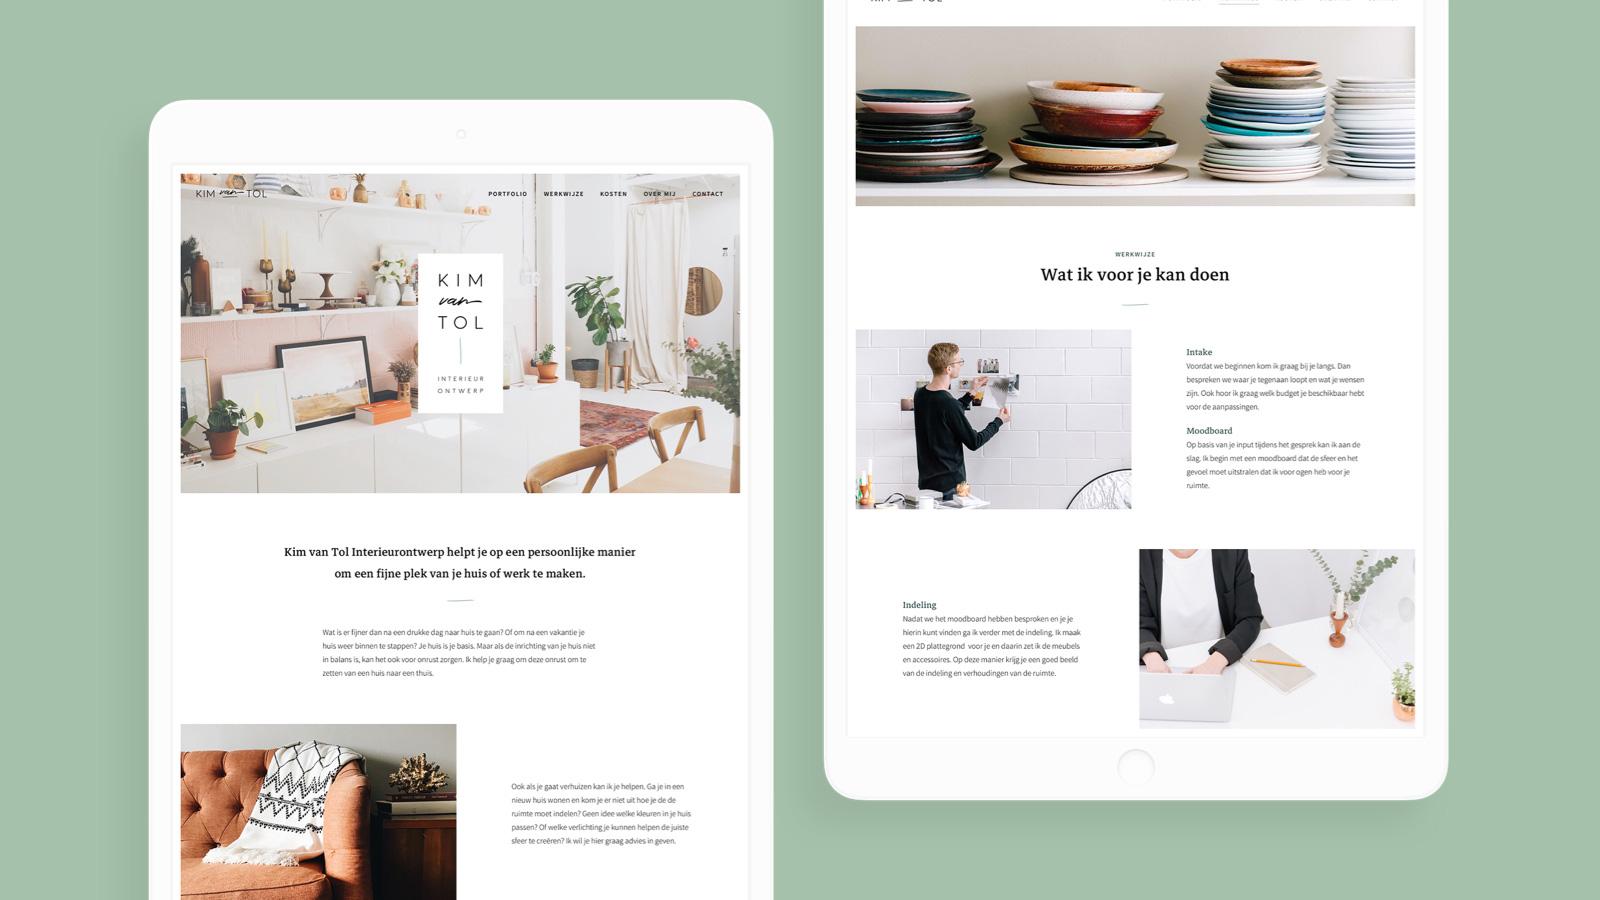 A versatile, minimal brand for interior designer Kim van Tol by Haelsum